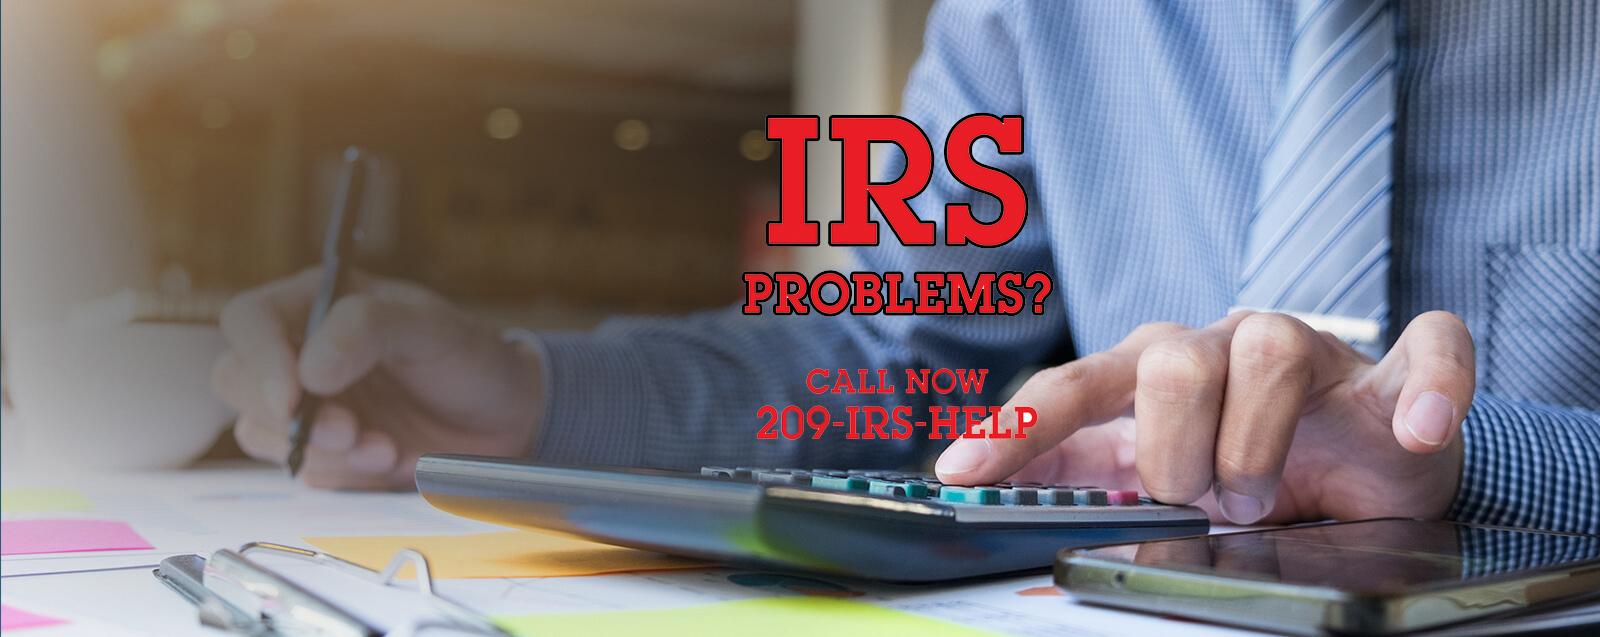 IRS proble s